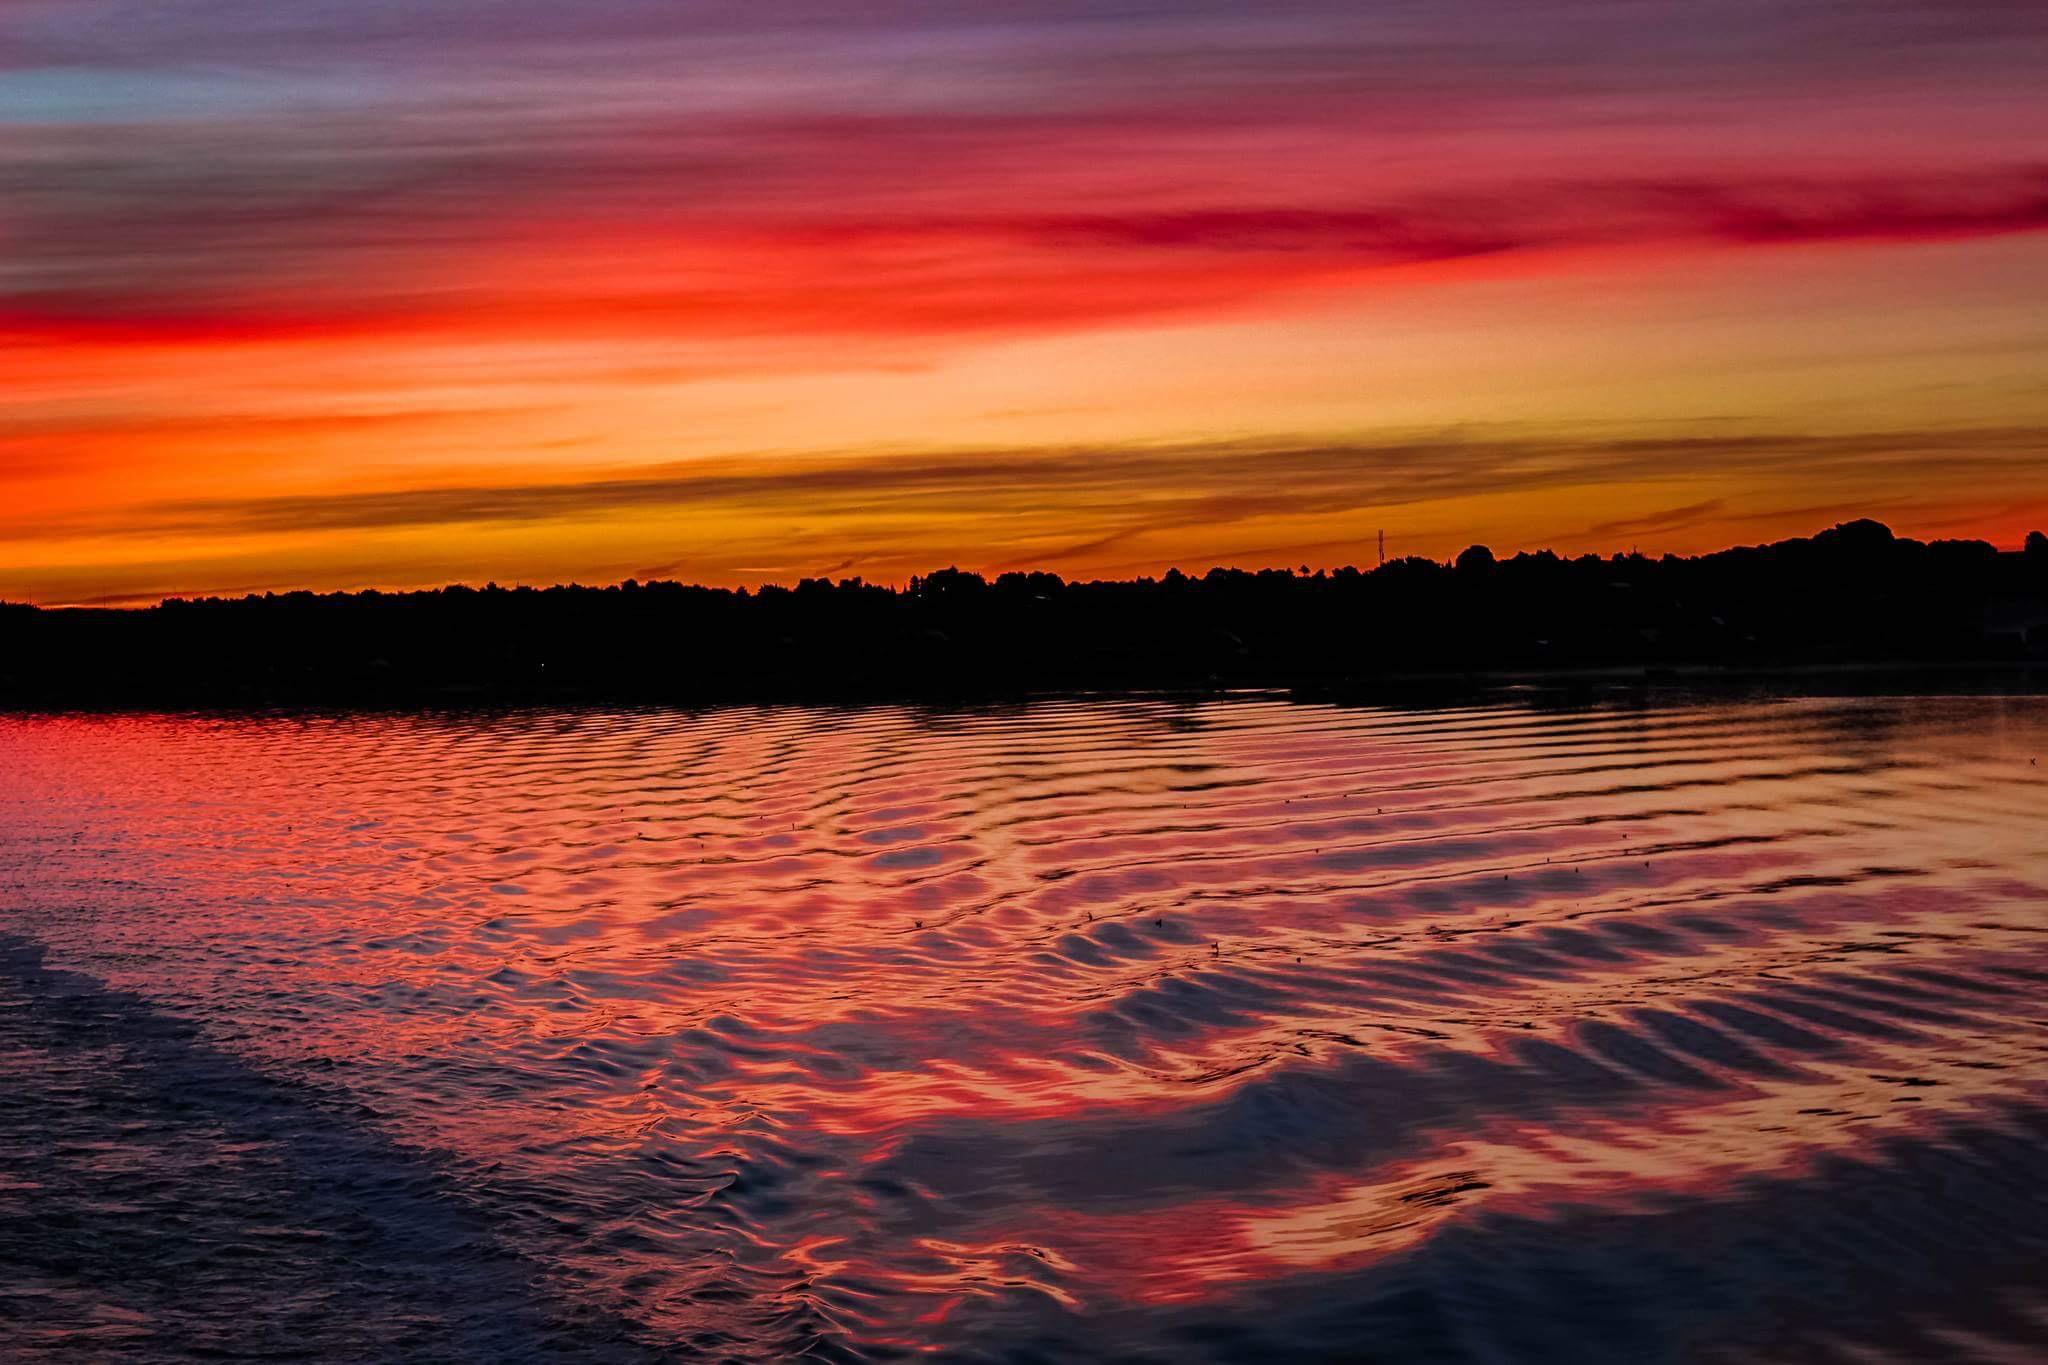 solnedgang 1